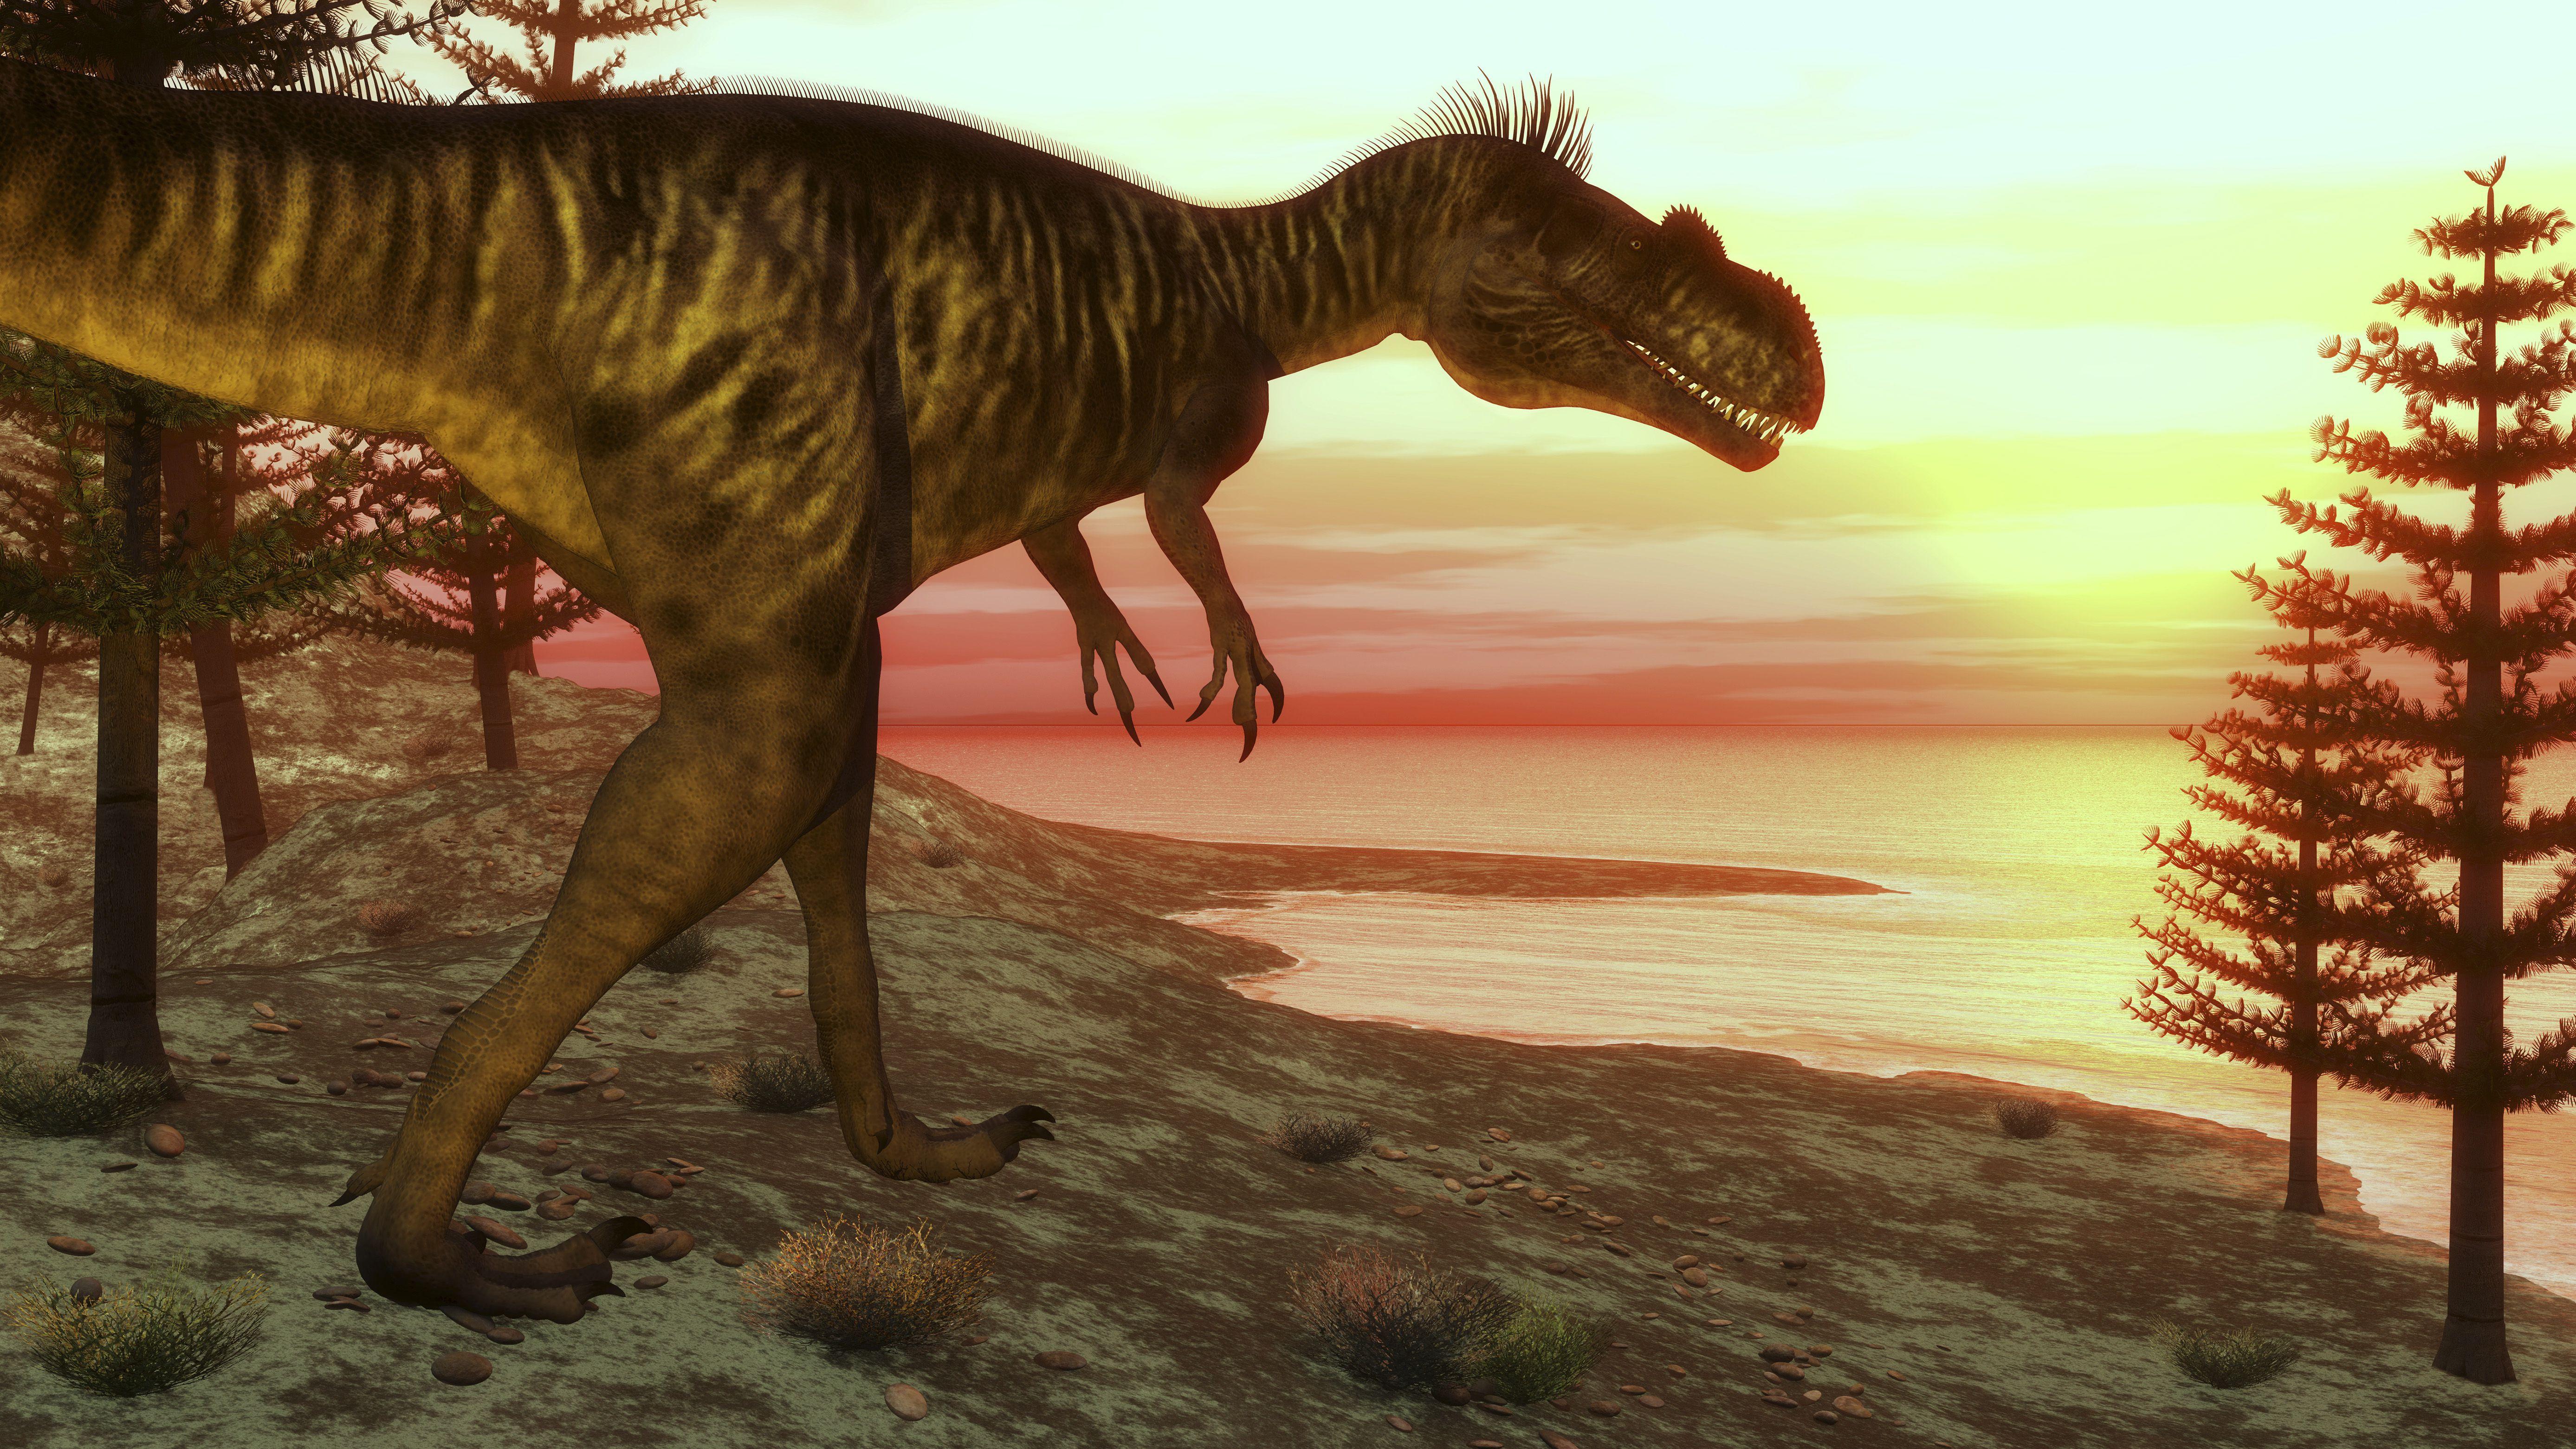 Megalosaurus dinosaur walking toward the ocean at sunset.